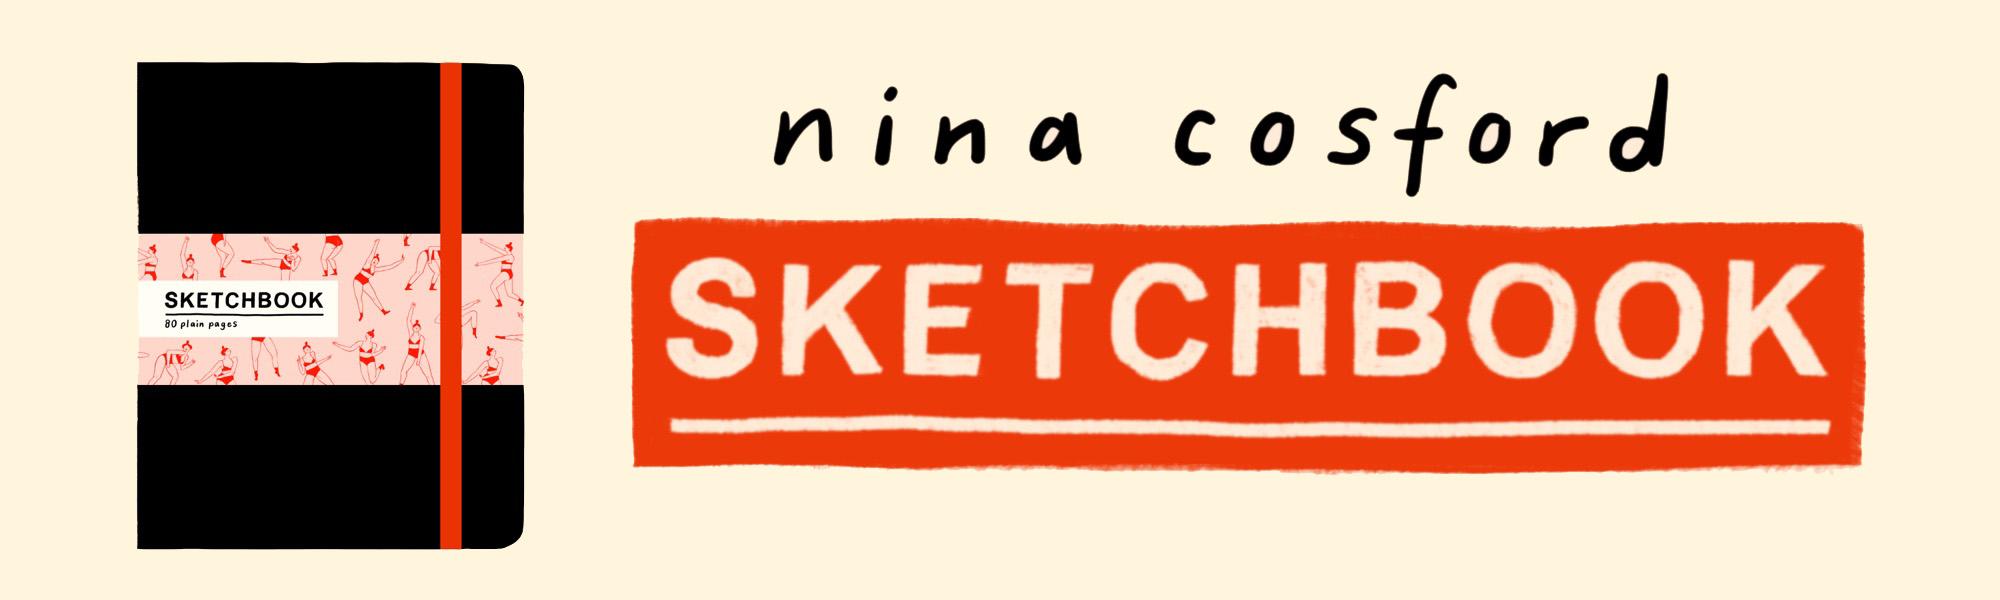 NINA COSFORD SKETCHBOOK